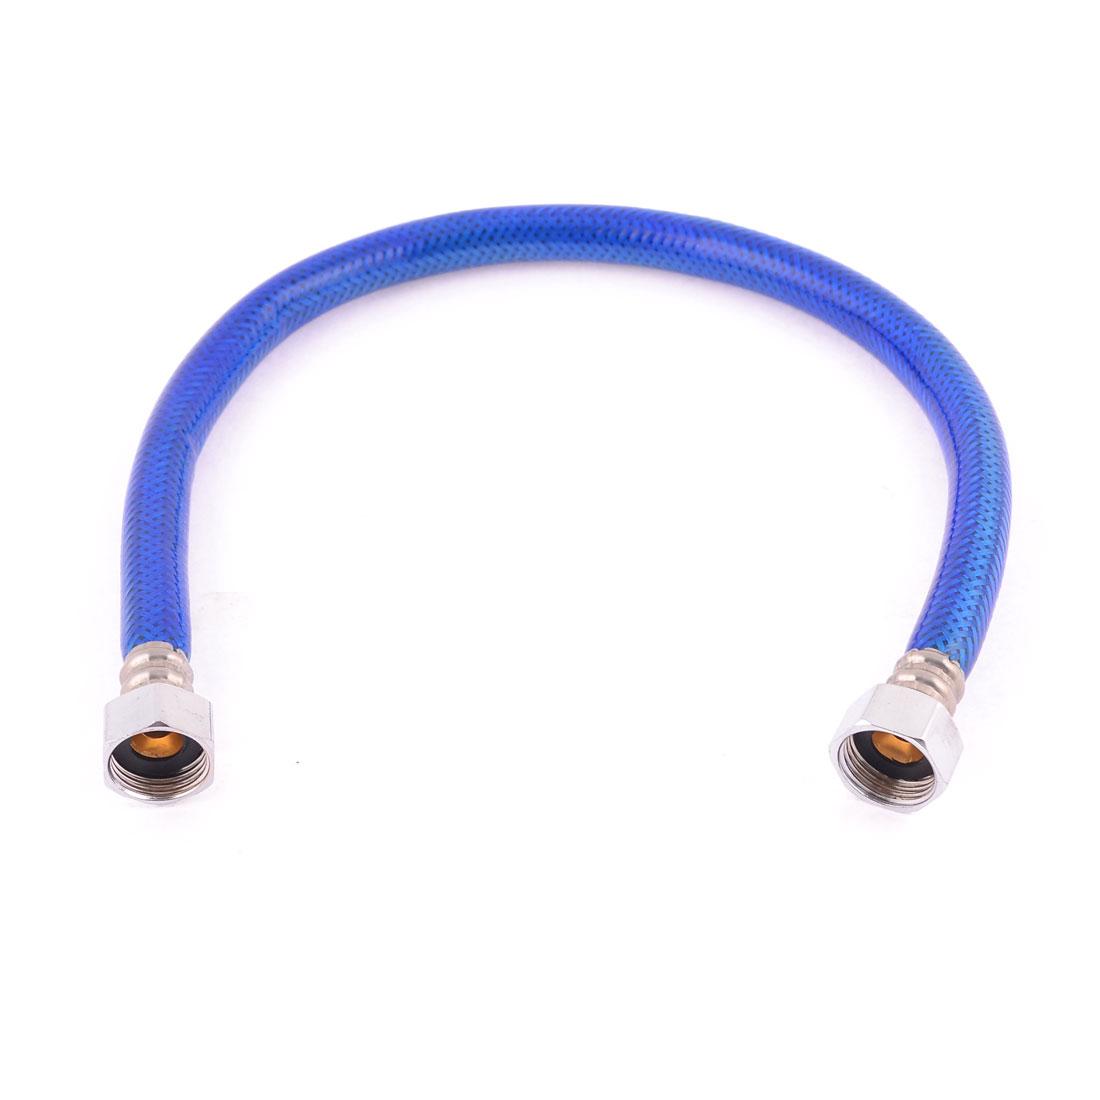 "50cm Long 1/2""NPT Thread Flexible Shower Hose Water Heater Tube Pipe Blue"